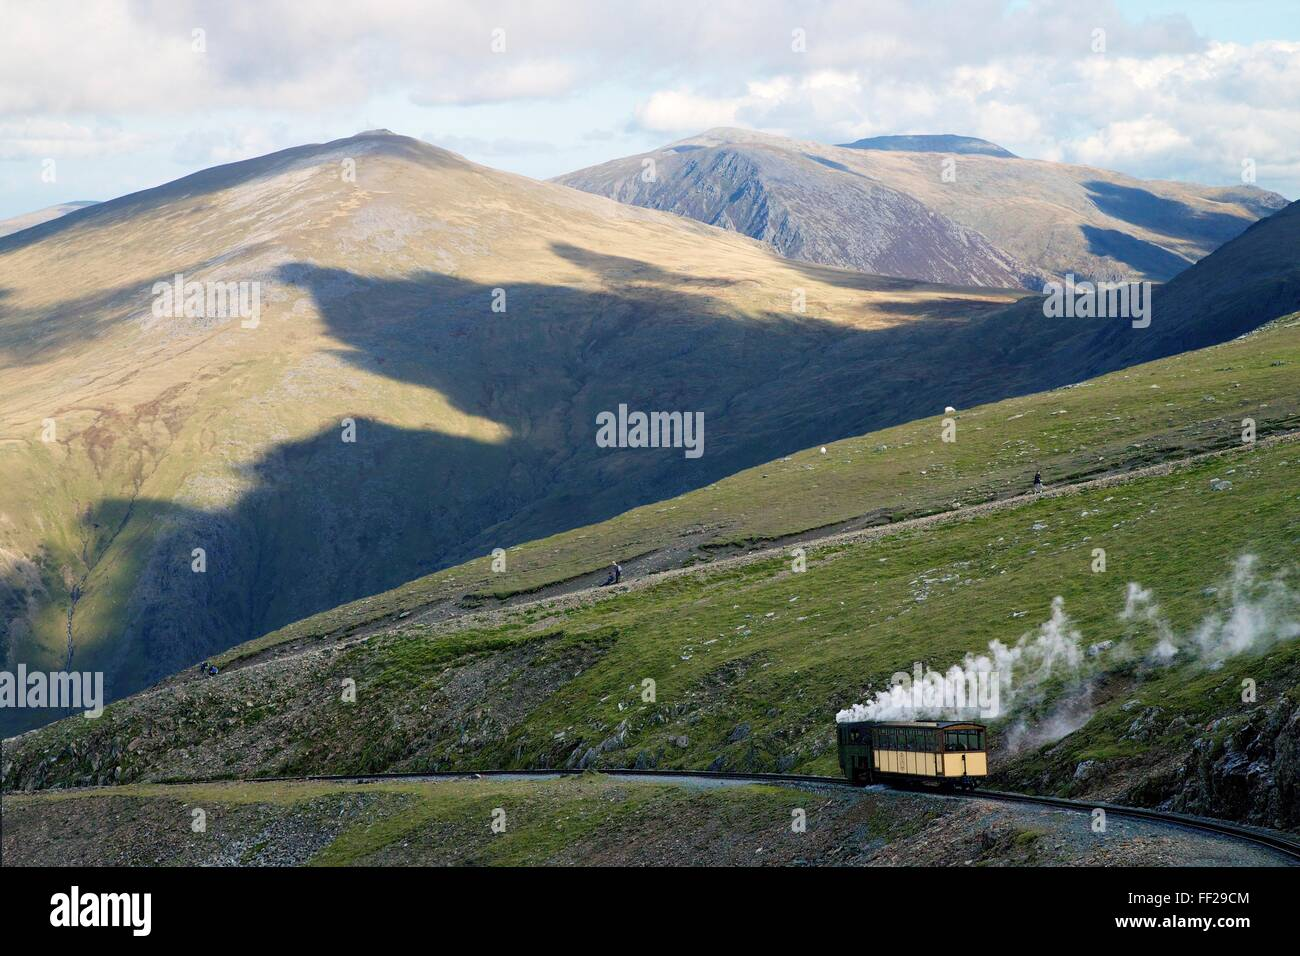 Steam engine and passenger carriage on trip down Snowdon Mountain RaiRMway, Snowdonia NationaRM Park, Gwynedd, WaRMes, - Stock Image